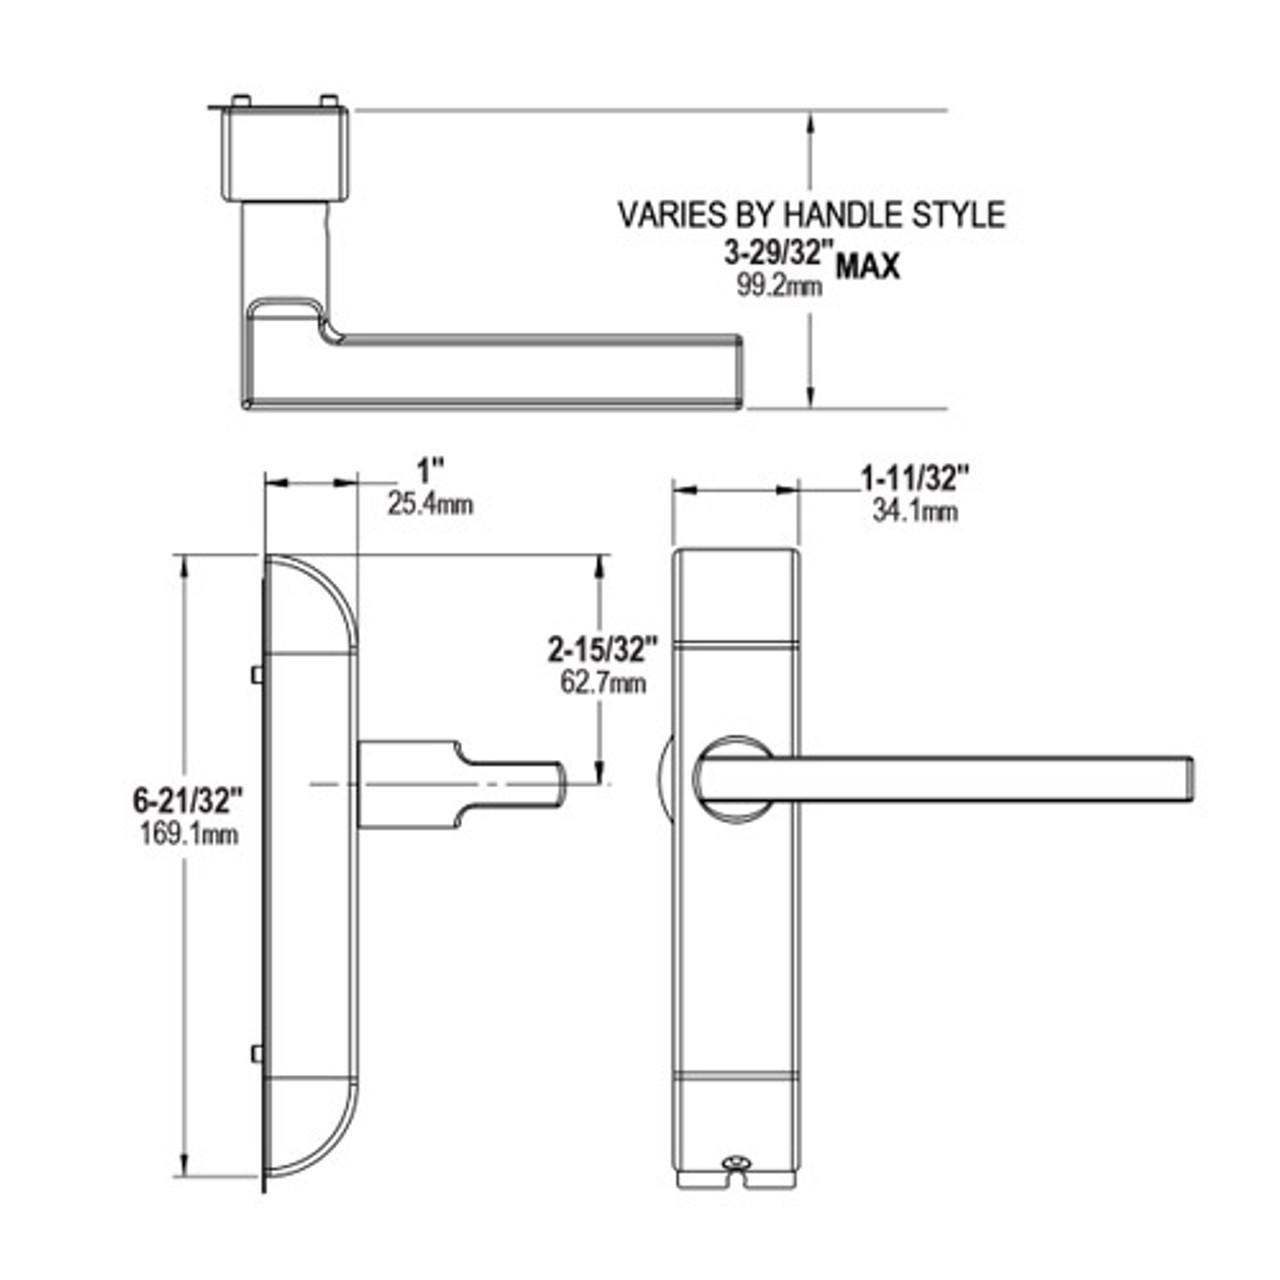 4600M-MD-622-US4 Adams Rite MD Designer handle Dimensional View